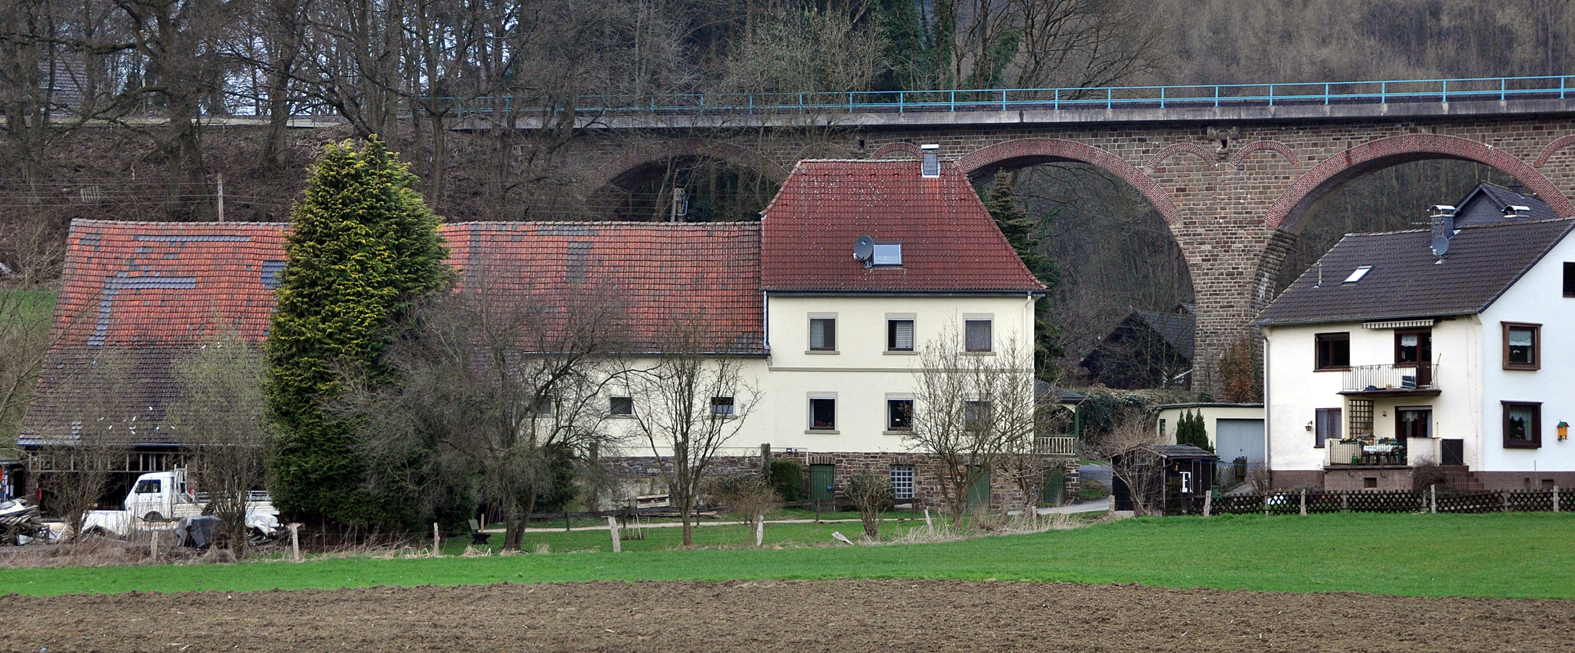 Haus an Brücke